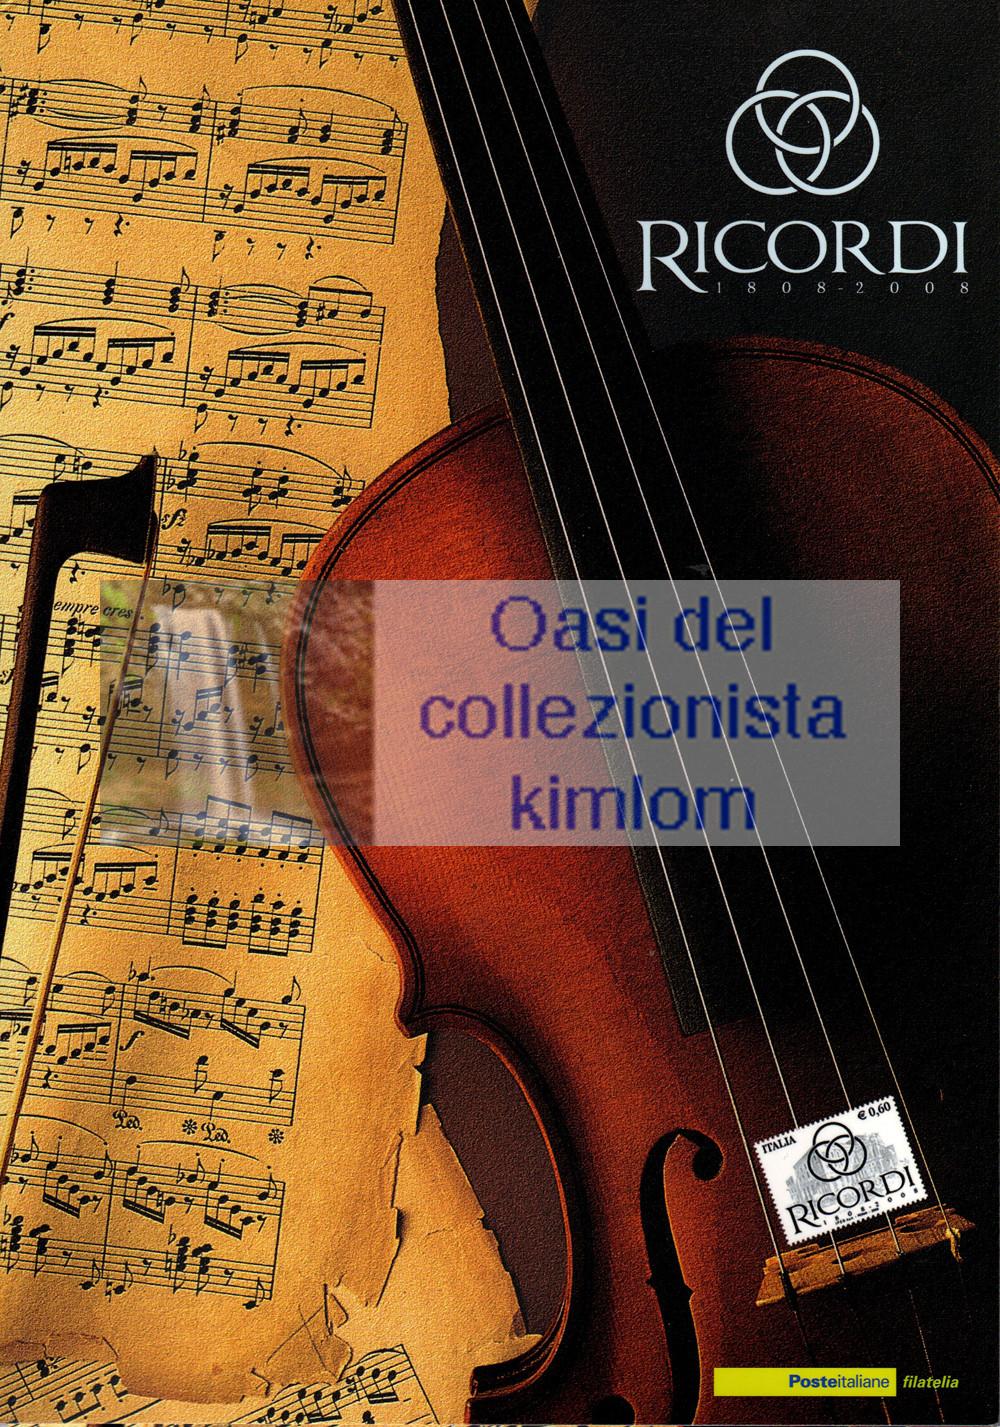 folder - Ricordi 1808-2008